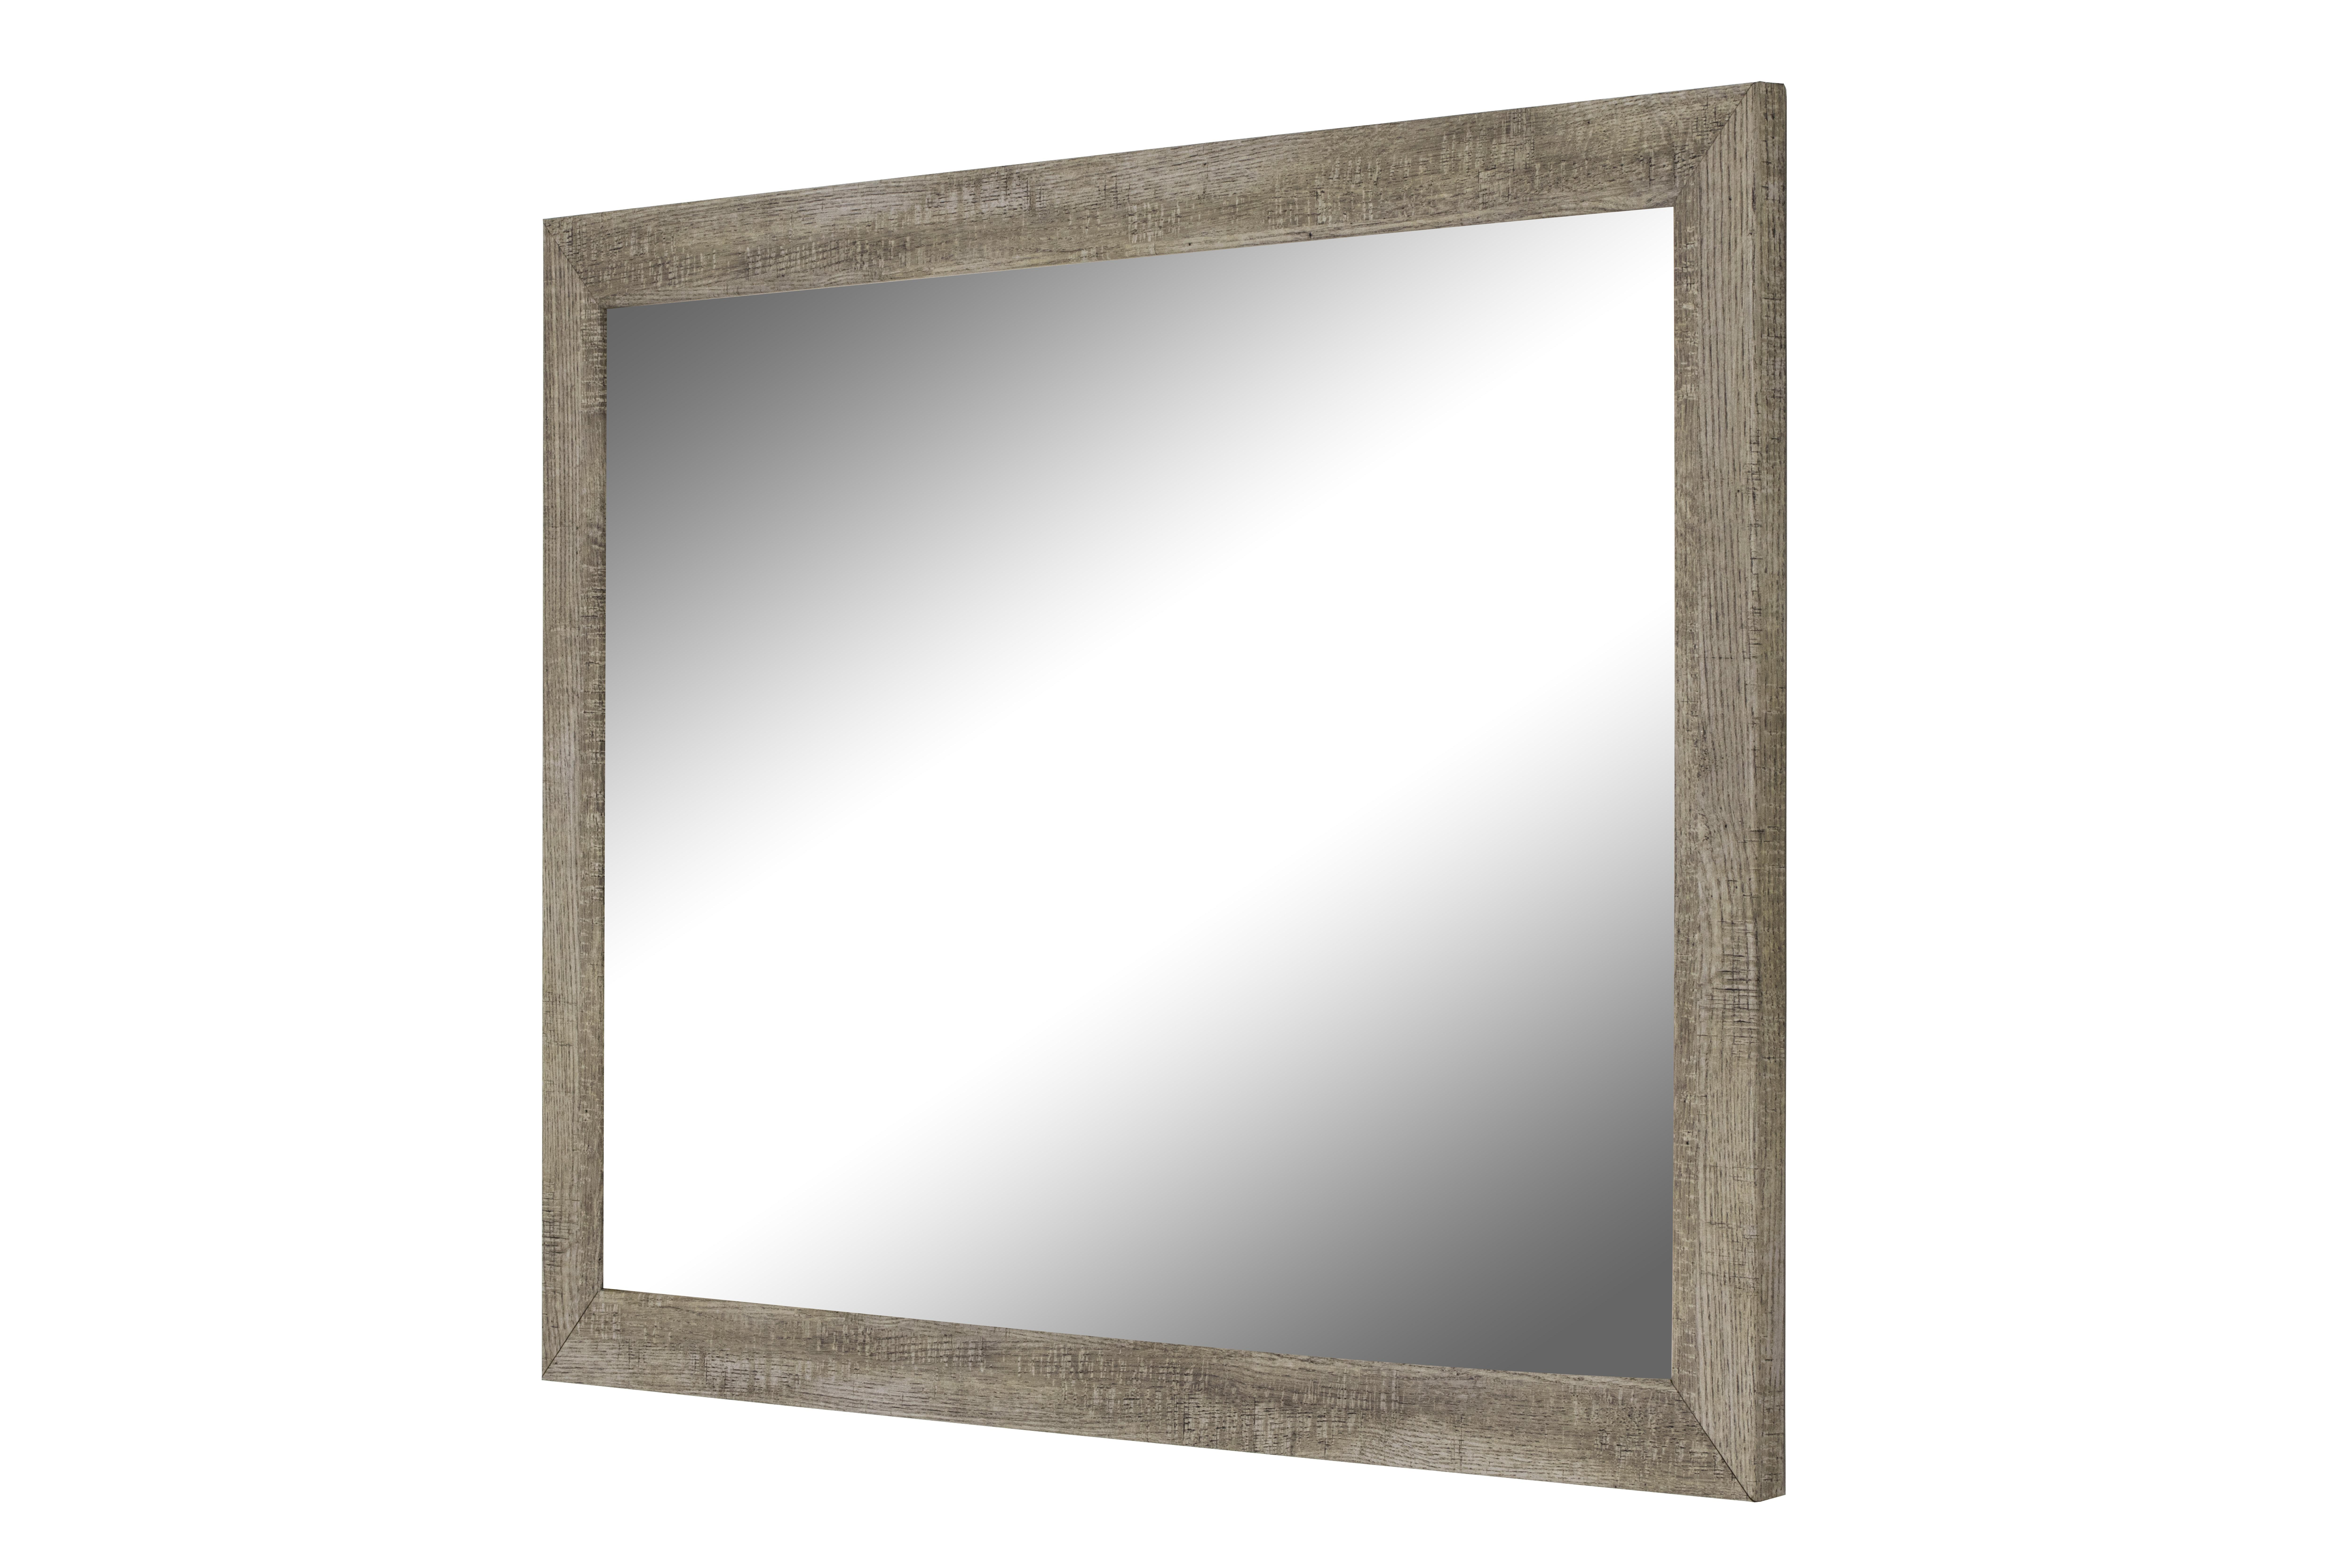 Mariyah Country Barnwood Traditional Wall Mirror Regarding Traditional Metal Wall Mirrors (View 8 of 30)